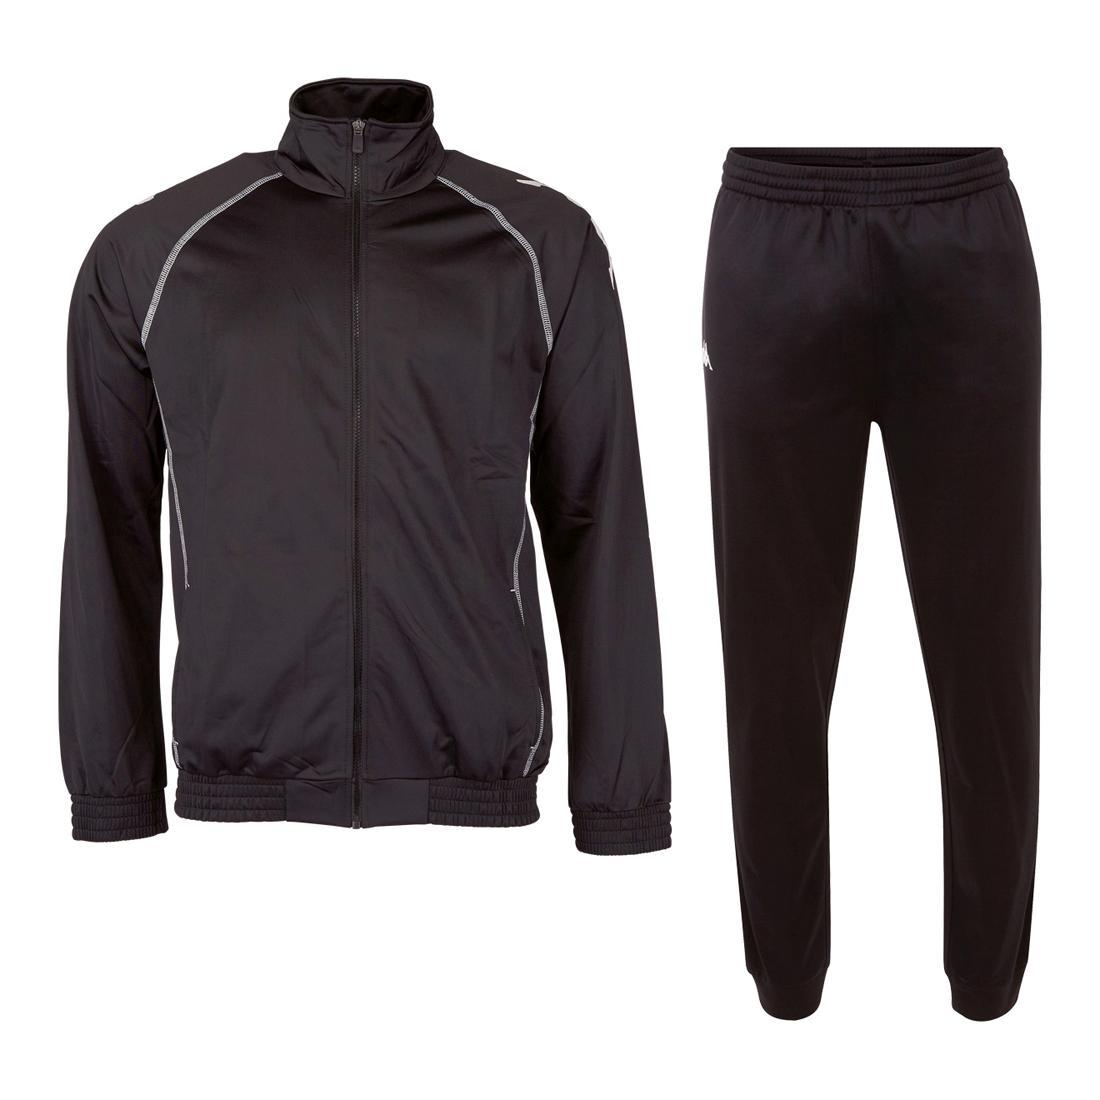 junkai M/änner Slim Fit Freizeithose Jogging Bottom Outwear Kordelzug Hose F/ür Gymnastik Workout Overall M-5XL